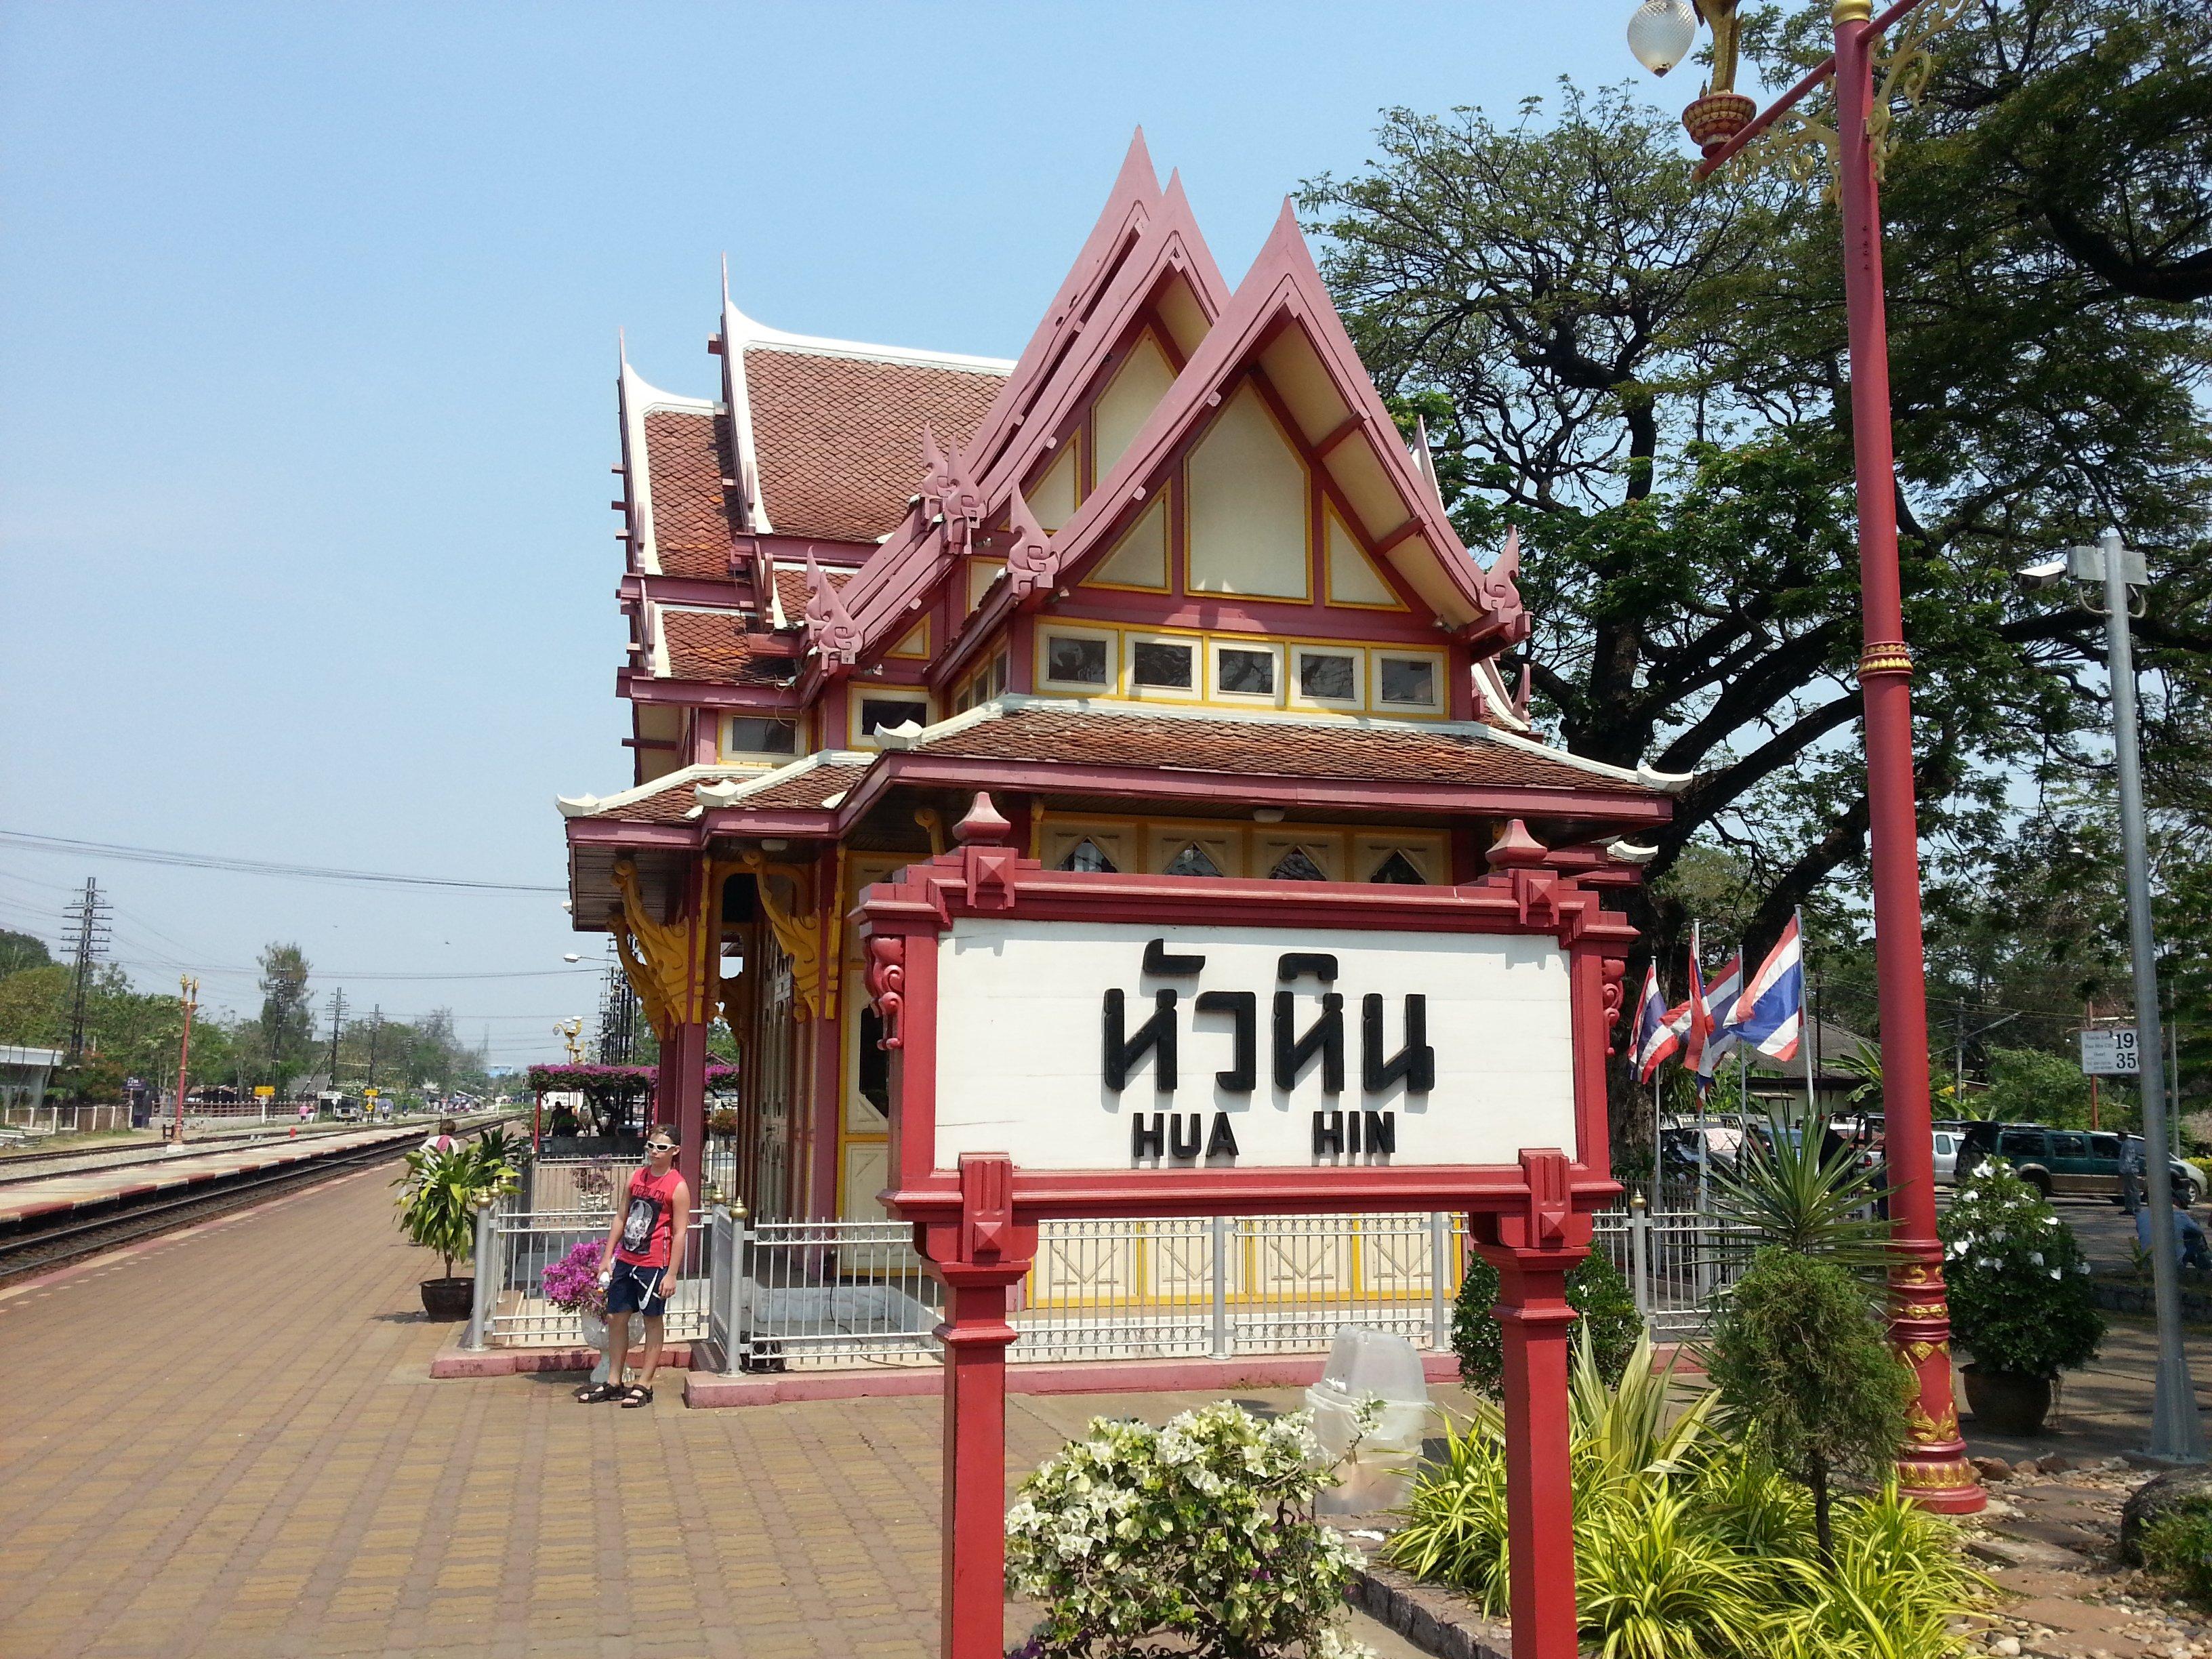 Hua Hin has a historic railway station